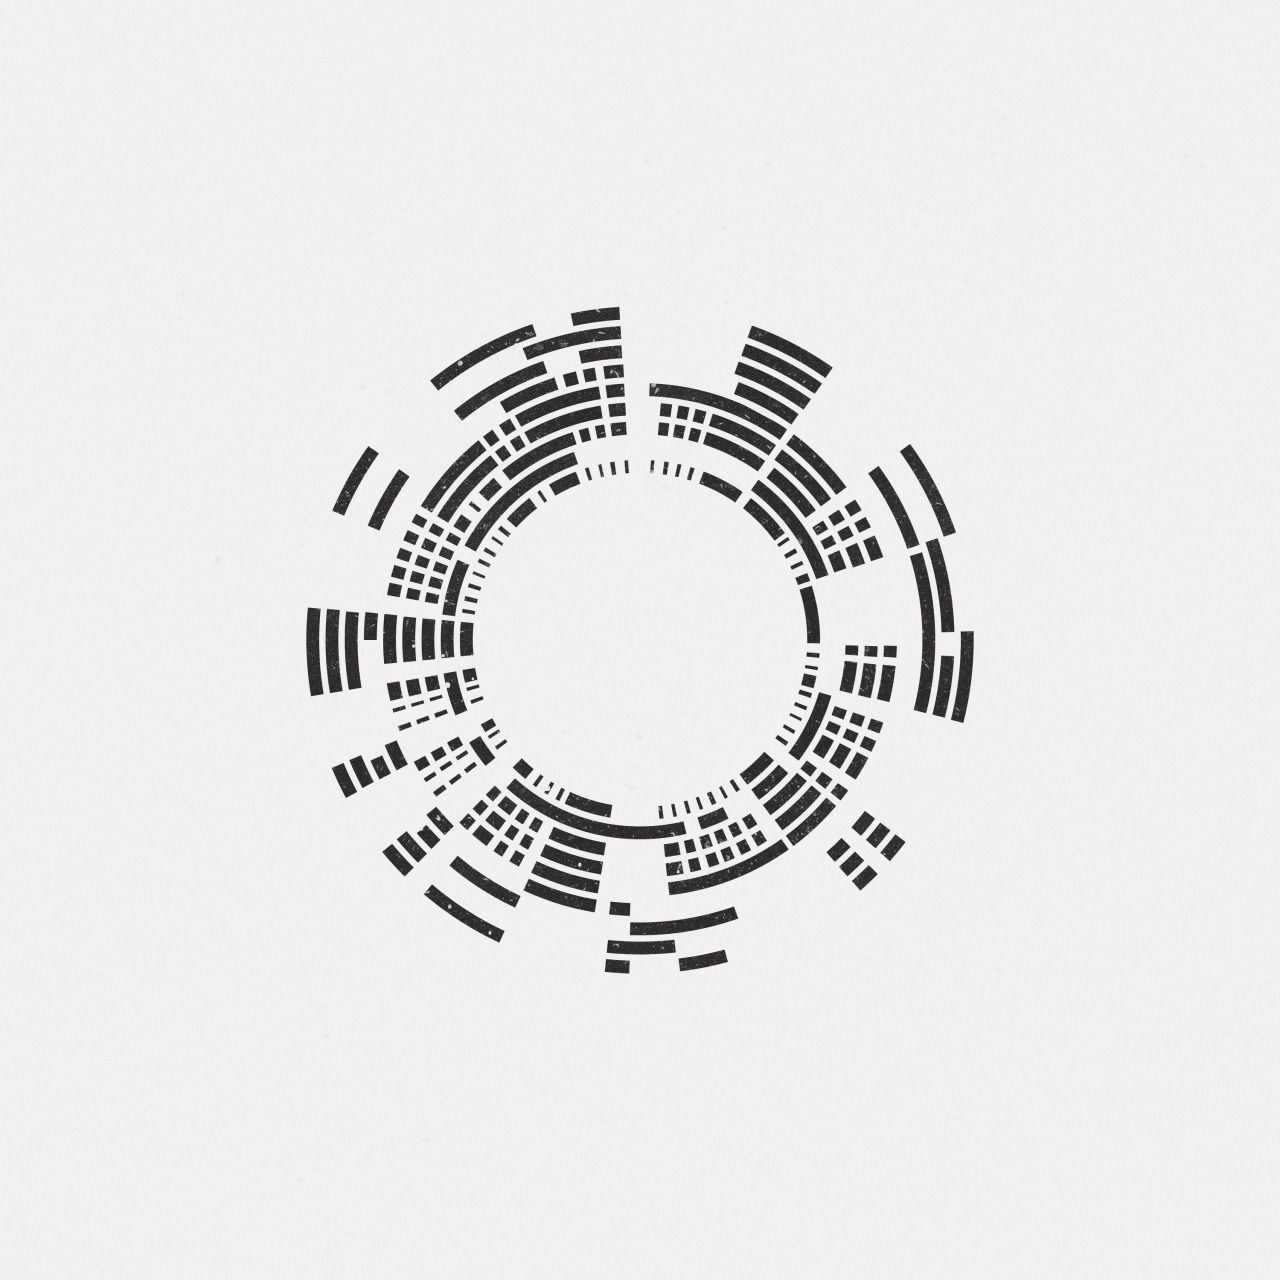 Daily Minimal #MA16-532 A new geometric design every